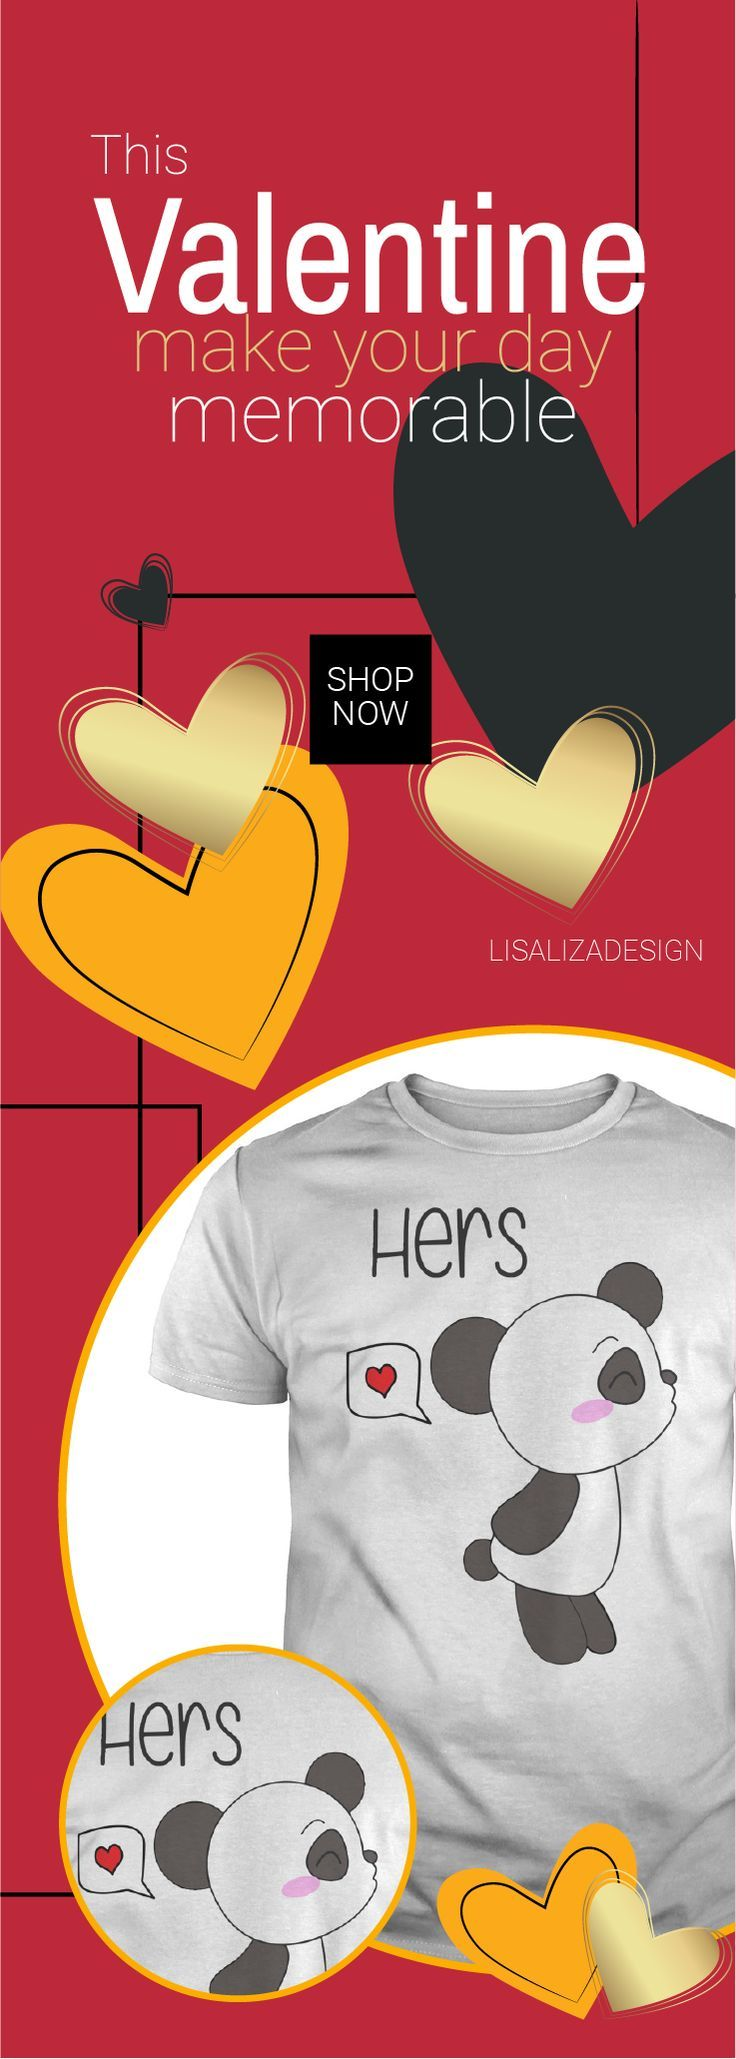 Couple her PANDA Valentine Animal Dad Mom Lady Man Woman Men Women Girl Boy .  Sunfrog Women/ Men  T Shirt / Hoodies  Love is in the air . Be My Valentine.  Shop for Darling Valentine TShirt from here.  #valentine  #valentine #valentinesday #valentinegift #lover #couple #inlove #Forhim #valentineforhim #forher #valentineday #sunfrog #lisaliza #giftideas #present #ideas #february #love #boyfriend #girlfriend